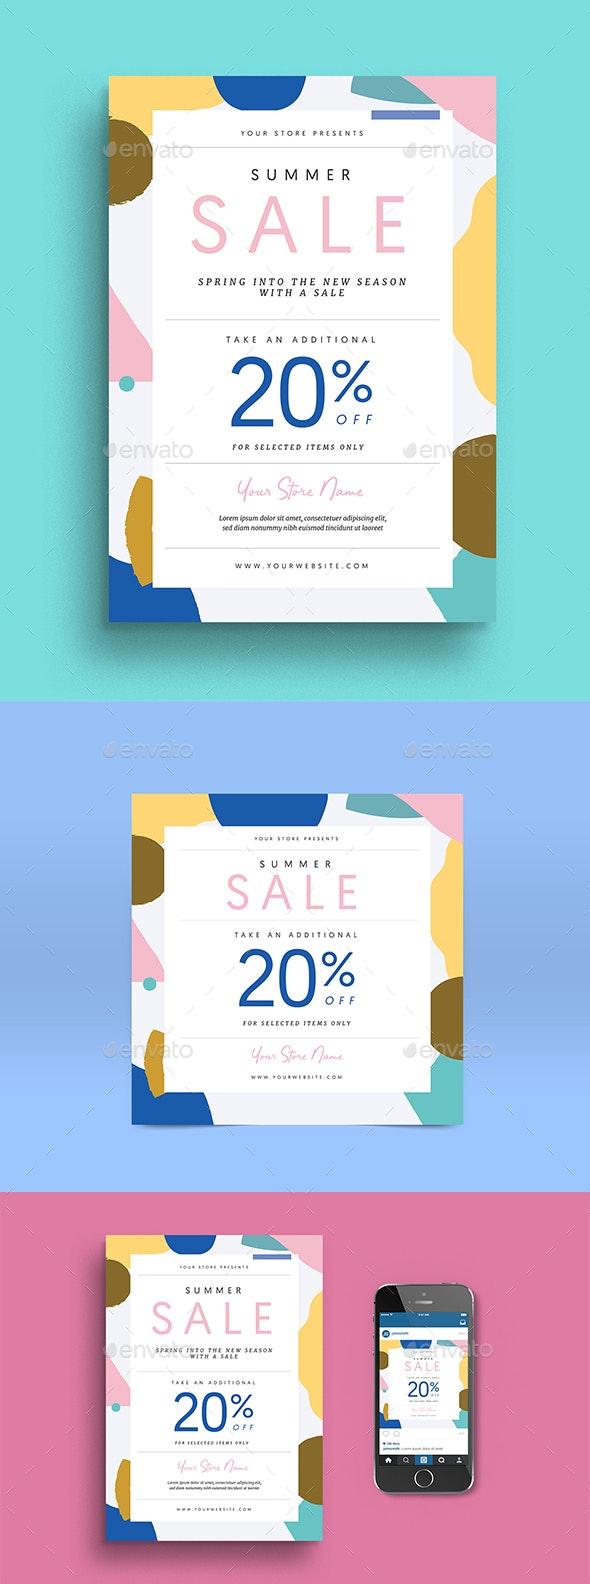 Summer Fashion Sale Flyer + Instagram Post - Commerce Flyers